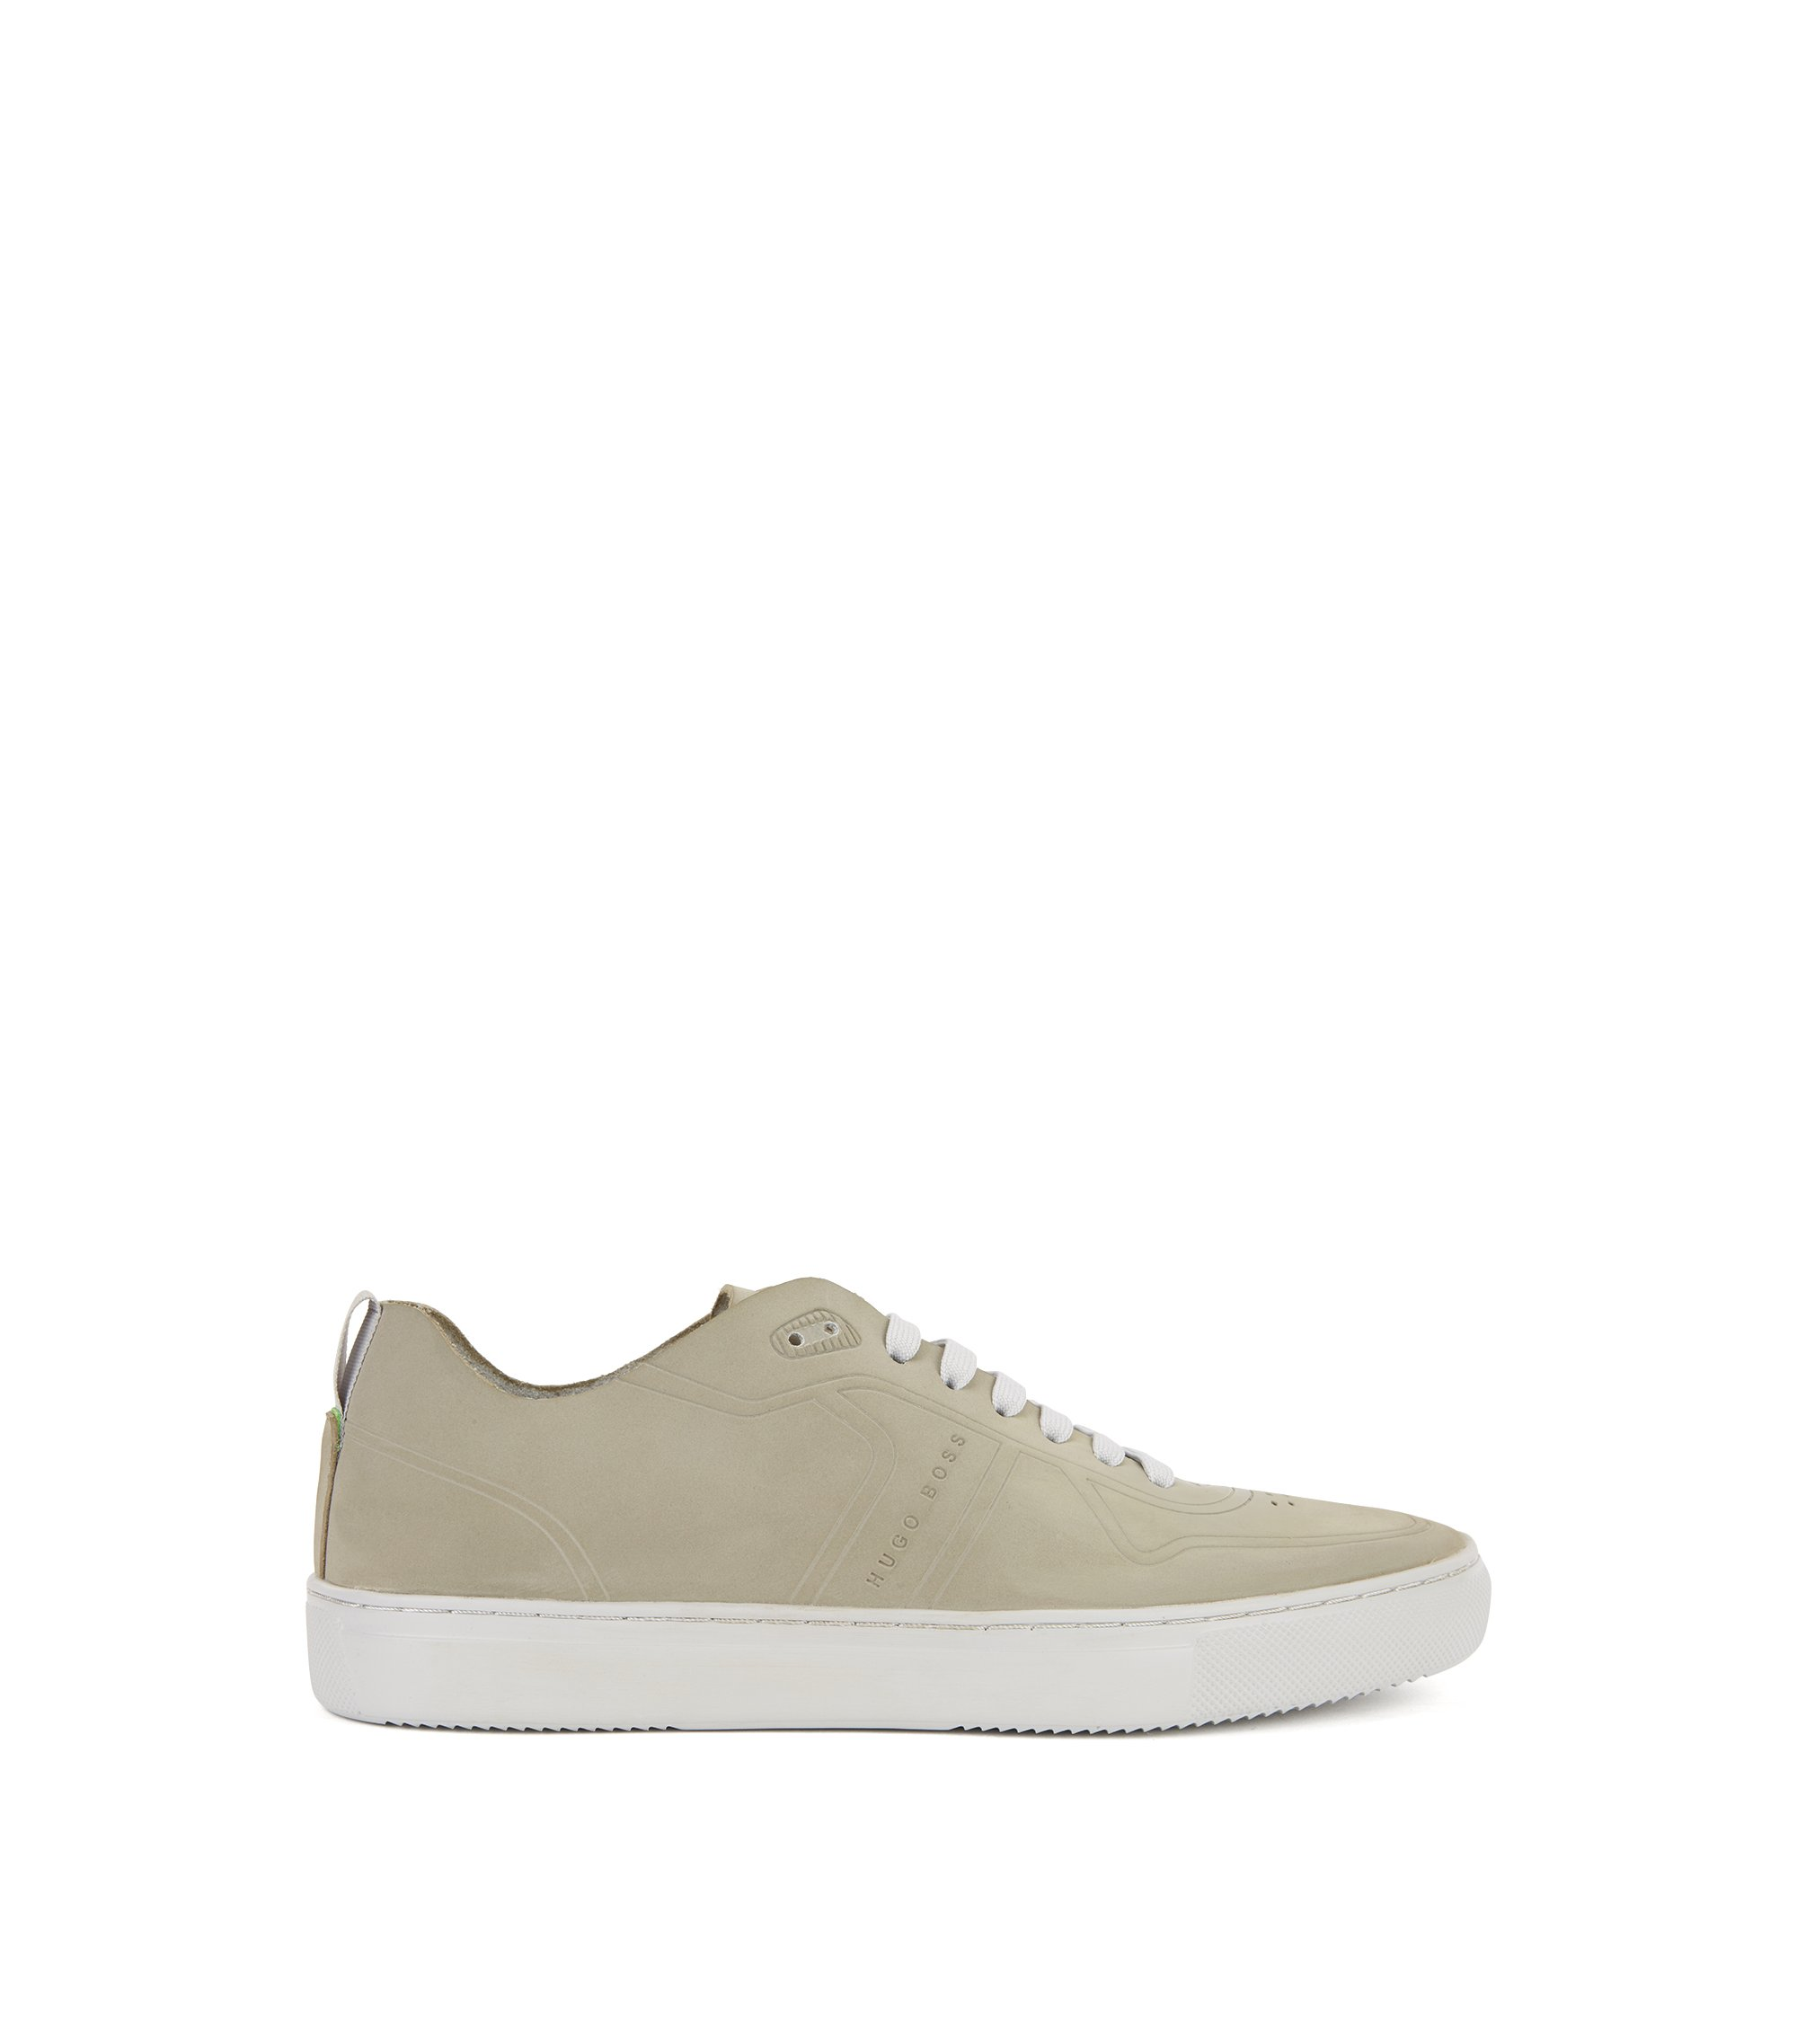 Sneakers aus Nubukleder im Tennis-Stil, Grau